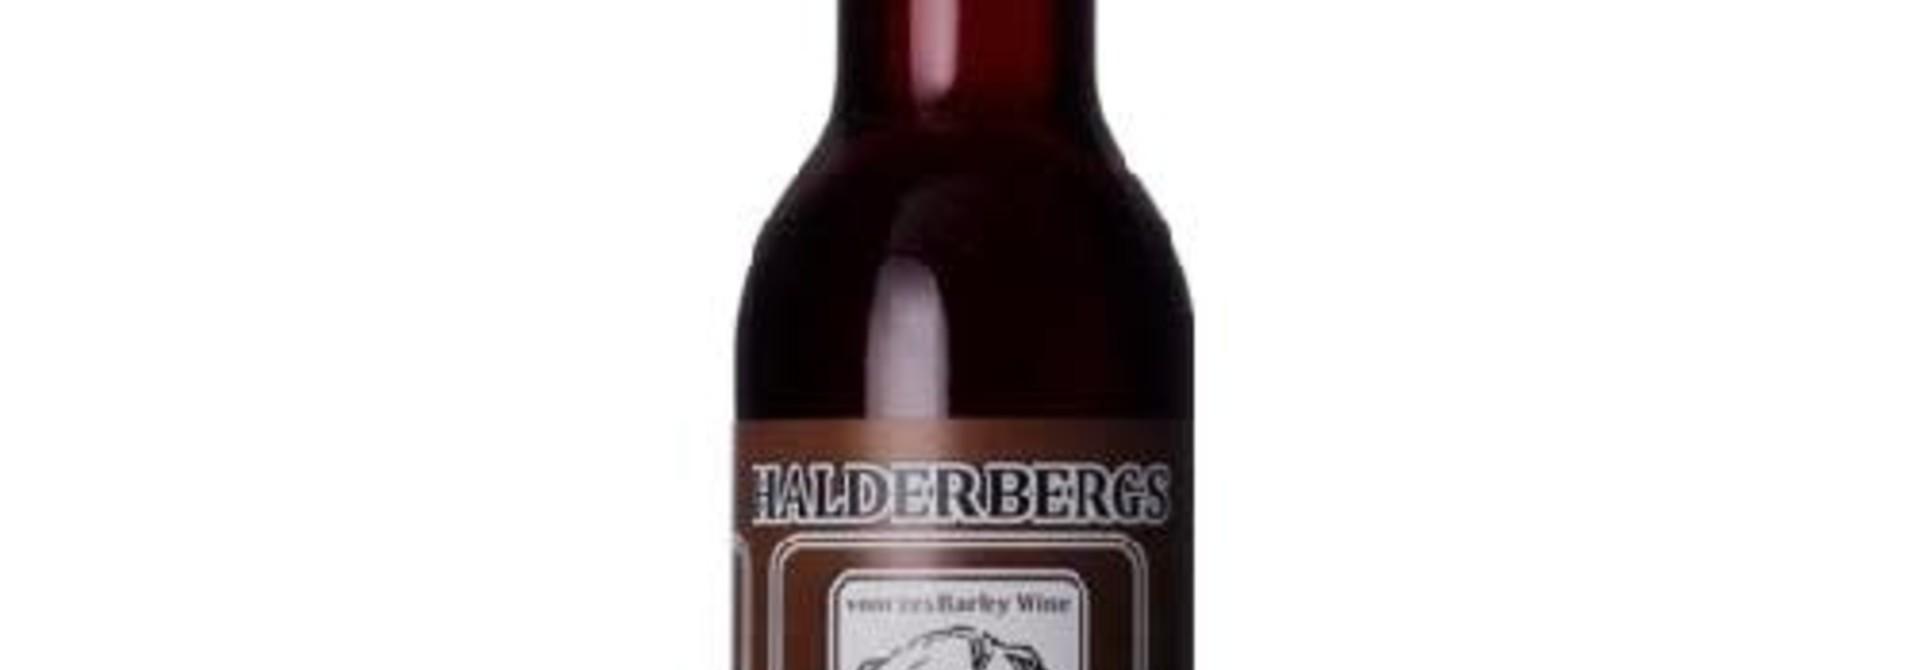 MEULENEIND - HALDEBERGS BARLEY WINE